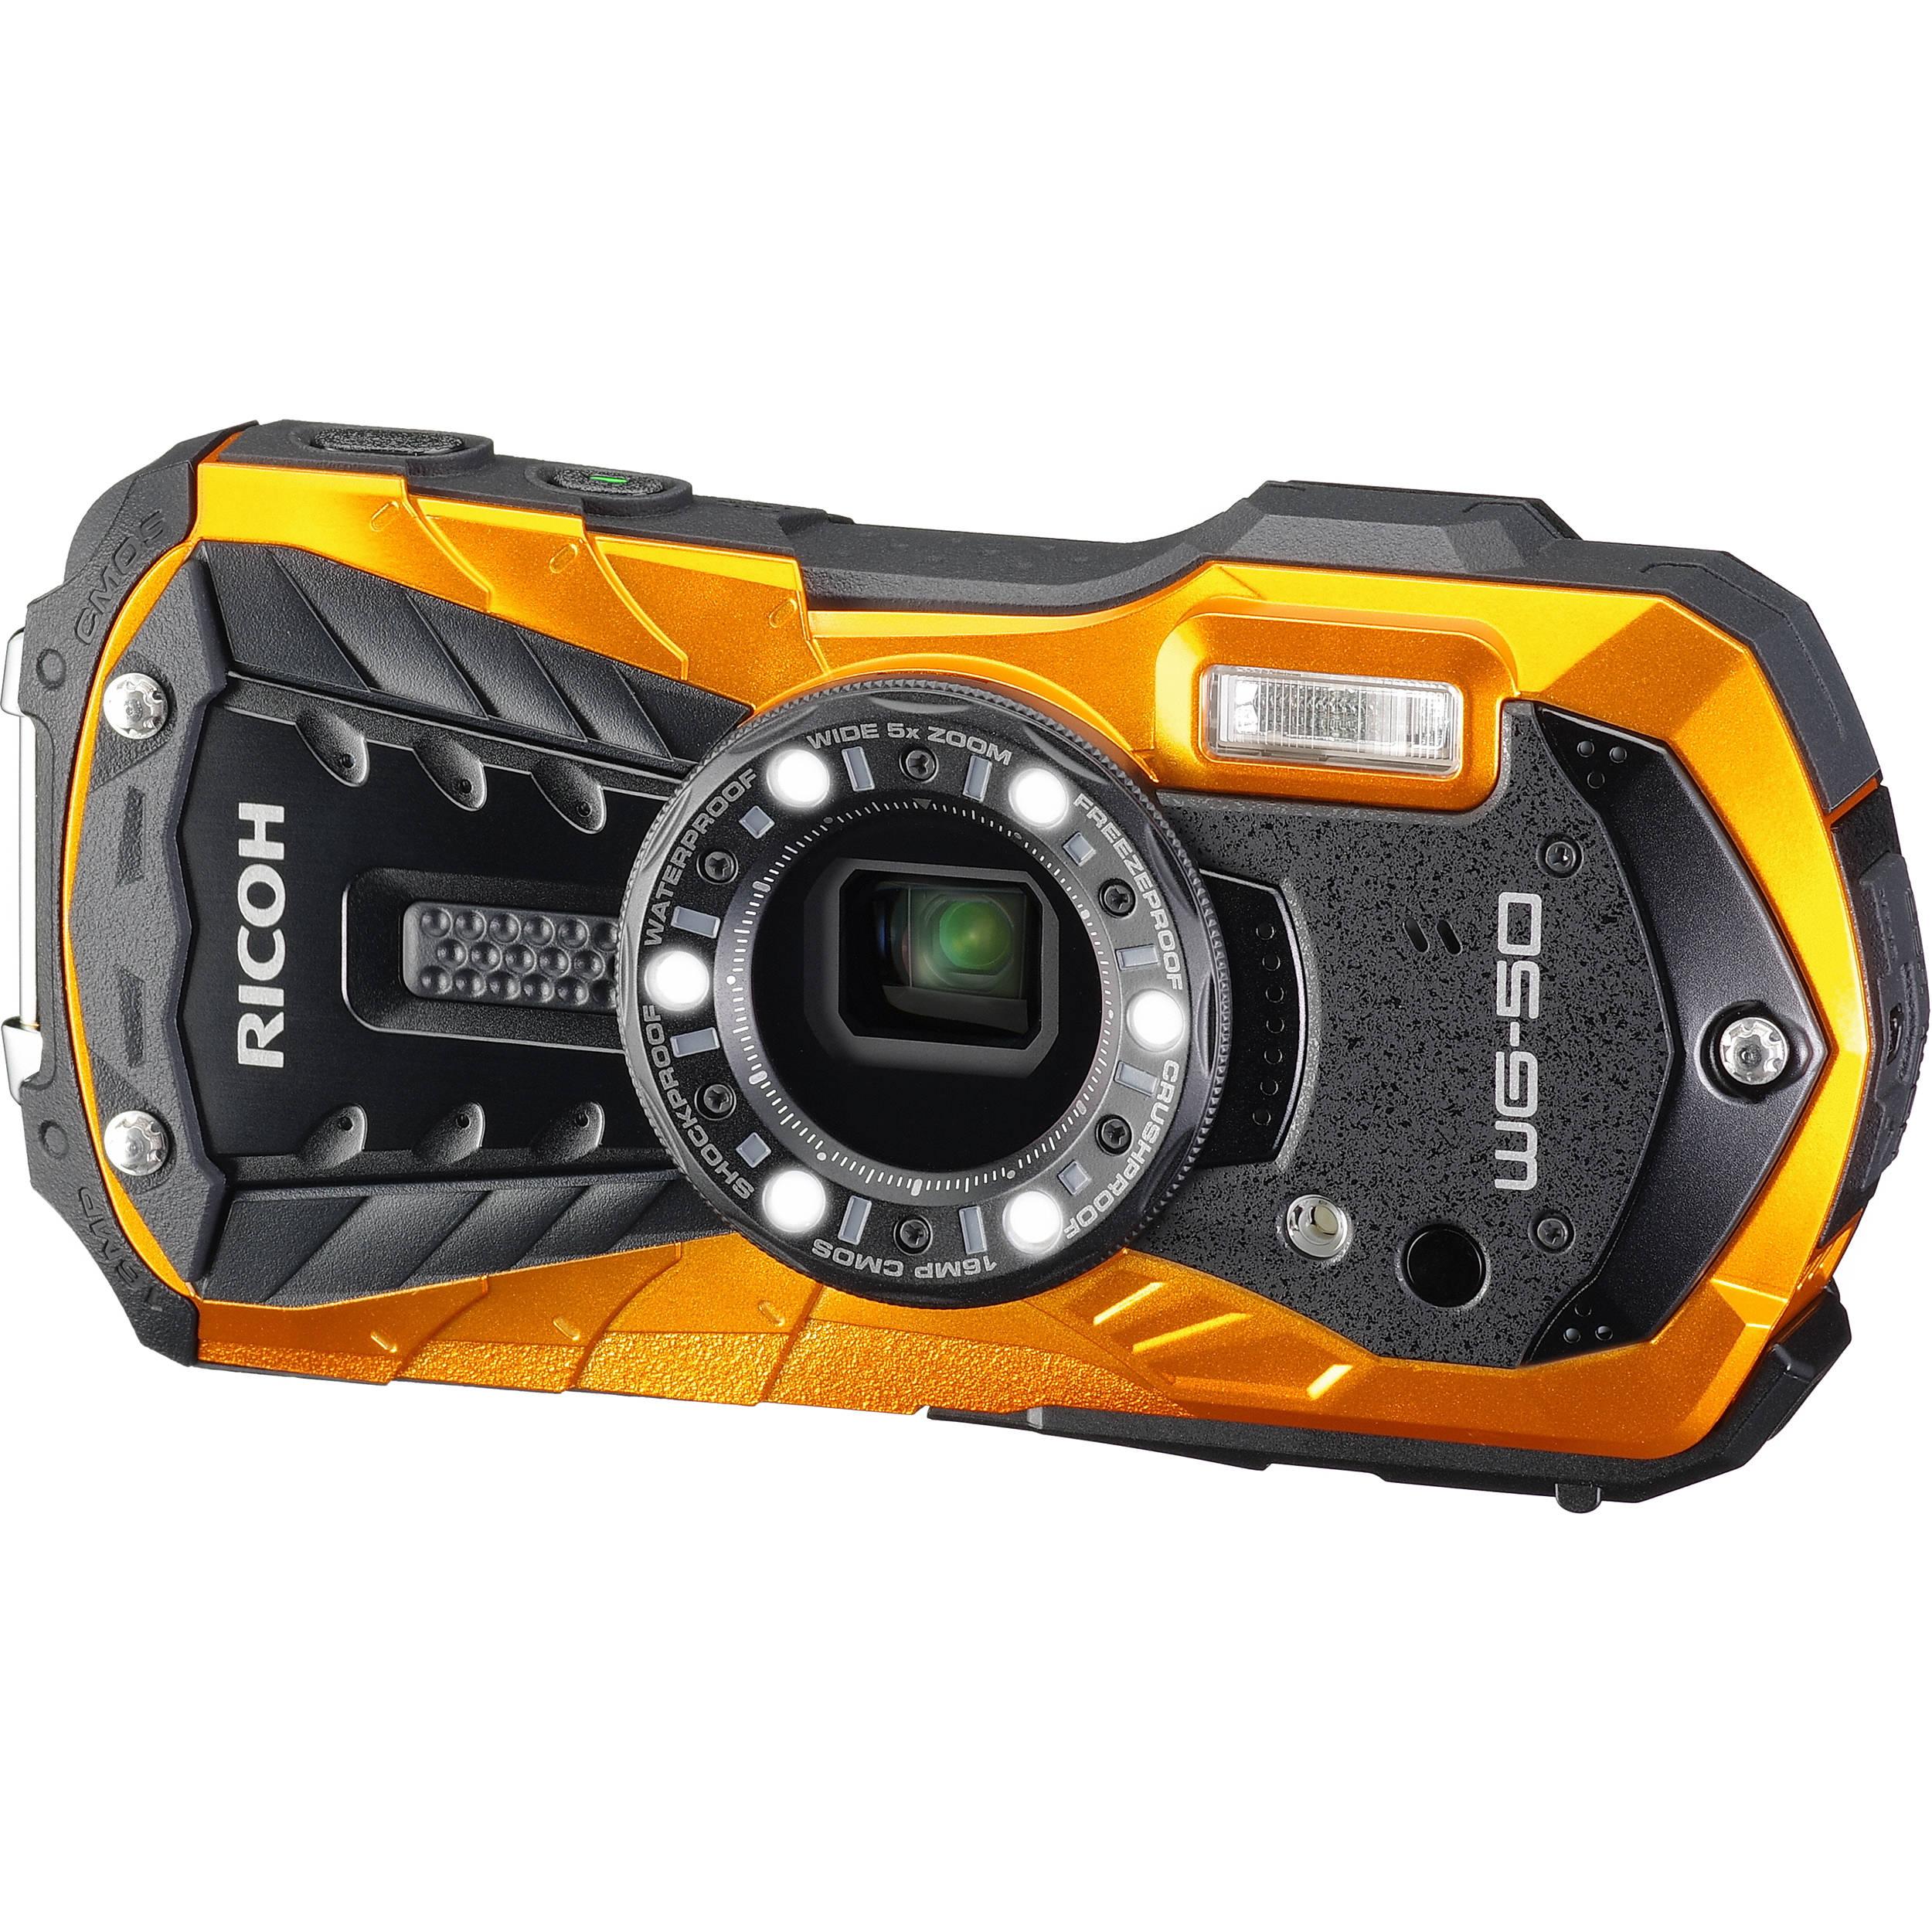 Ricoh Wg 50 Digital Camera Orange 04583 B Amp H Photo Video